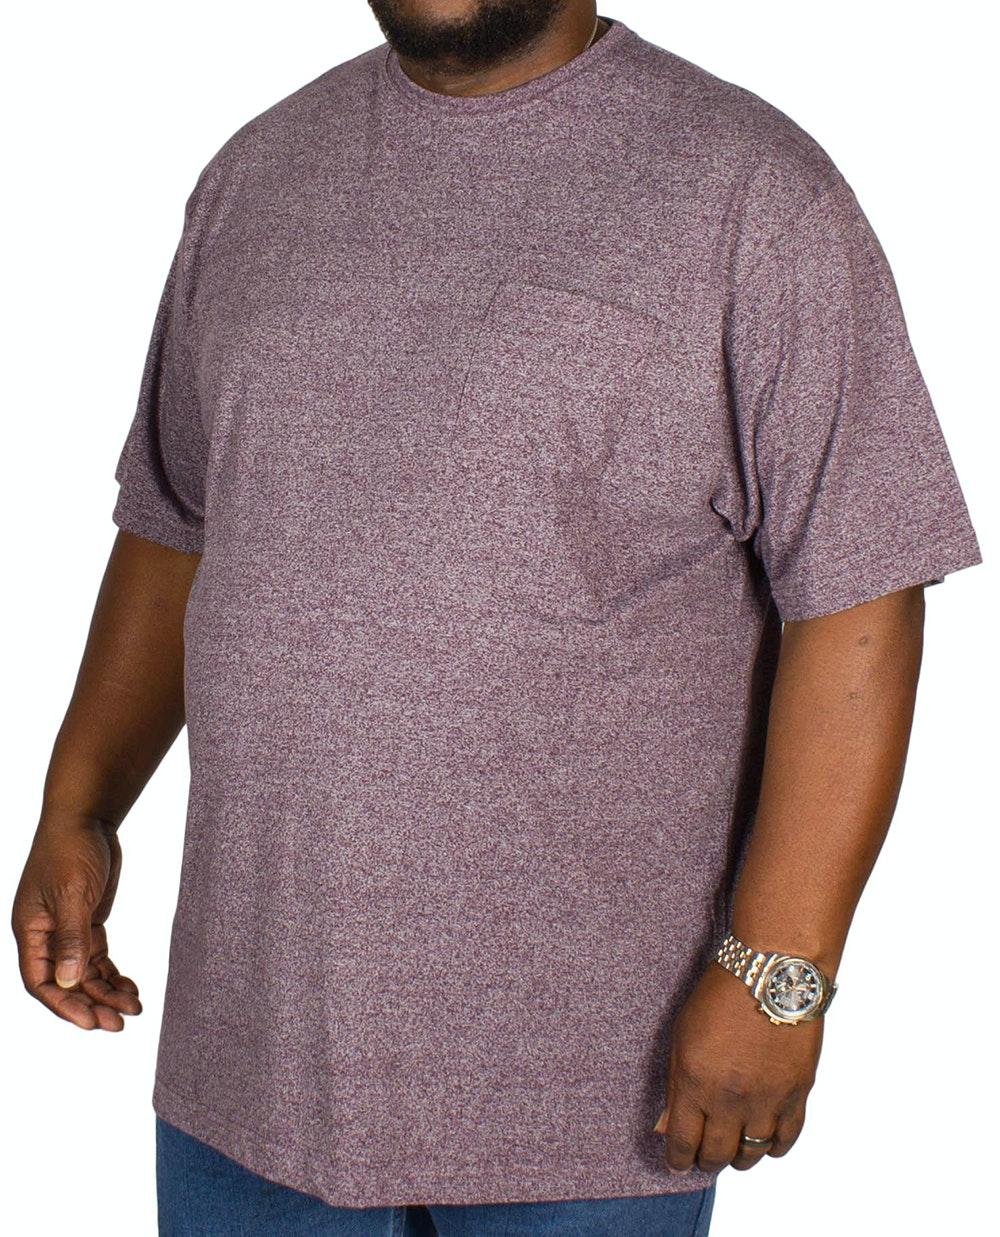 Espionage Jersey Marl T-shirt Grape